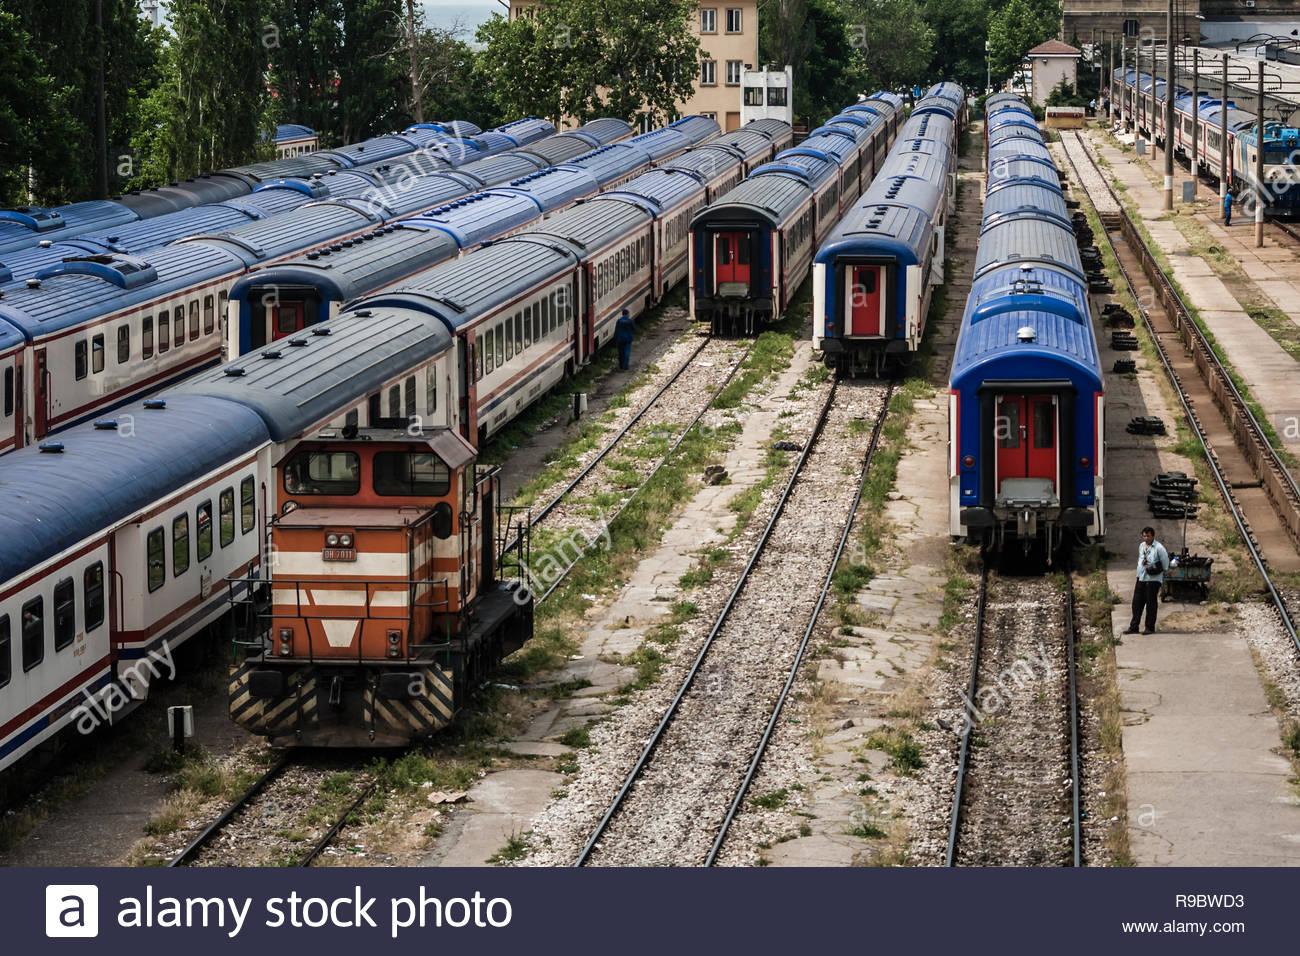 Istanbul, Turkey - Jun 1, 2009: Spare intercity train wagons on the rails - Stock Image